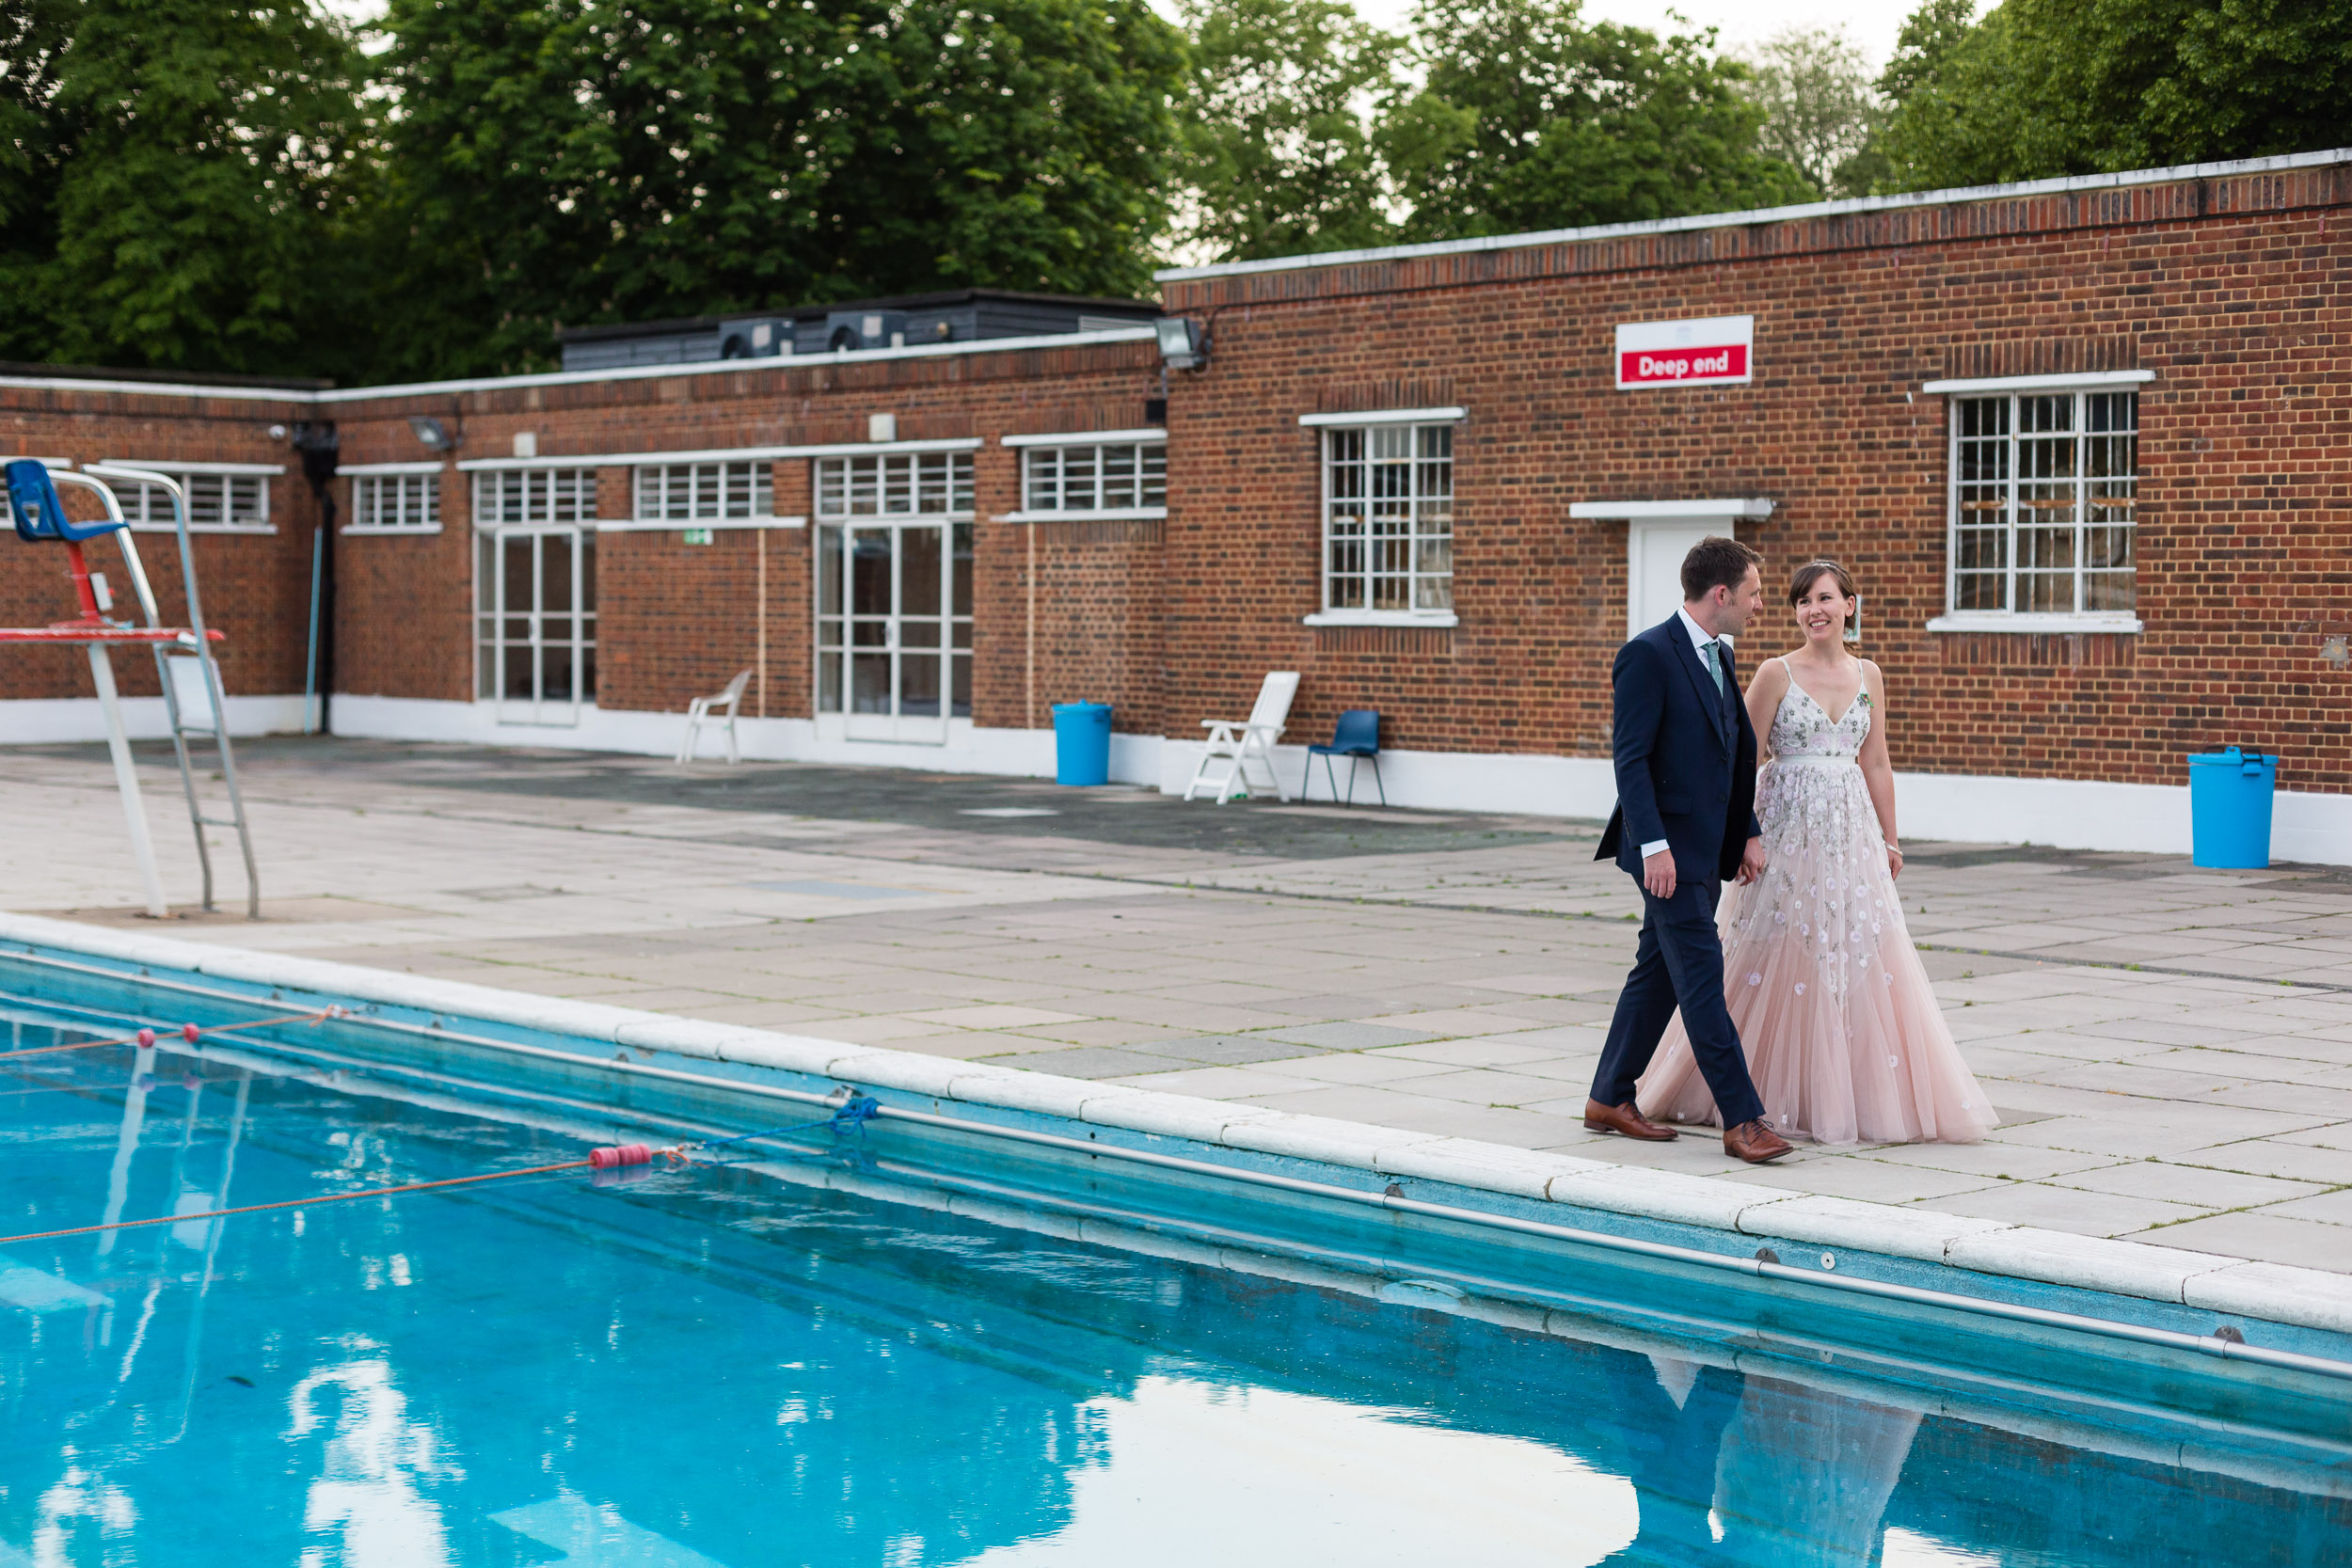 brockwell-lido-brixton-herne-hill-wedding-382.jpg